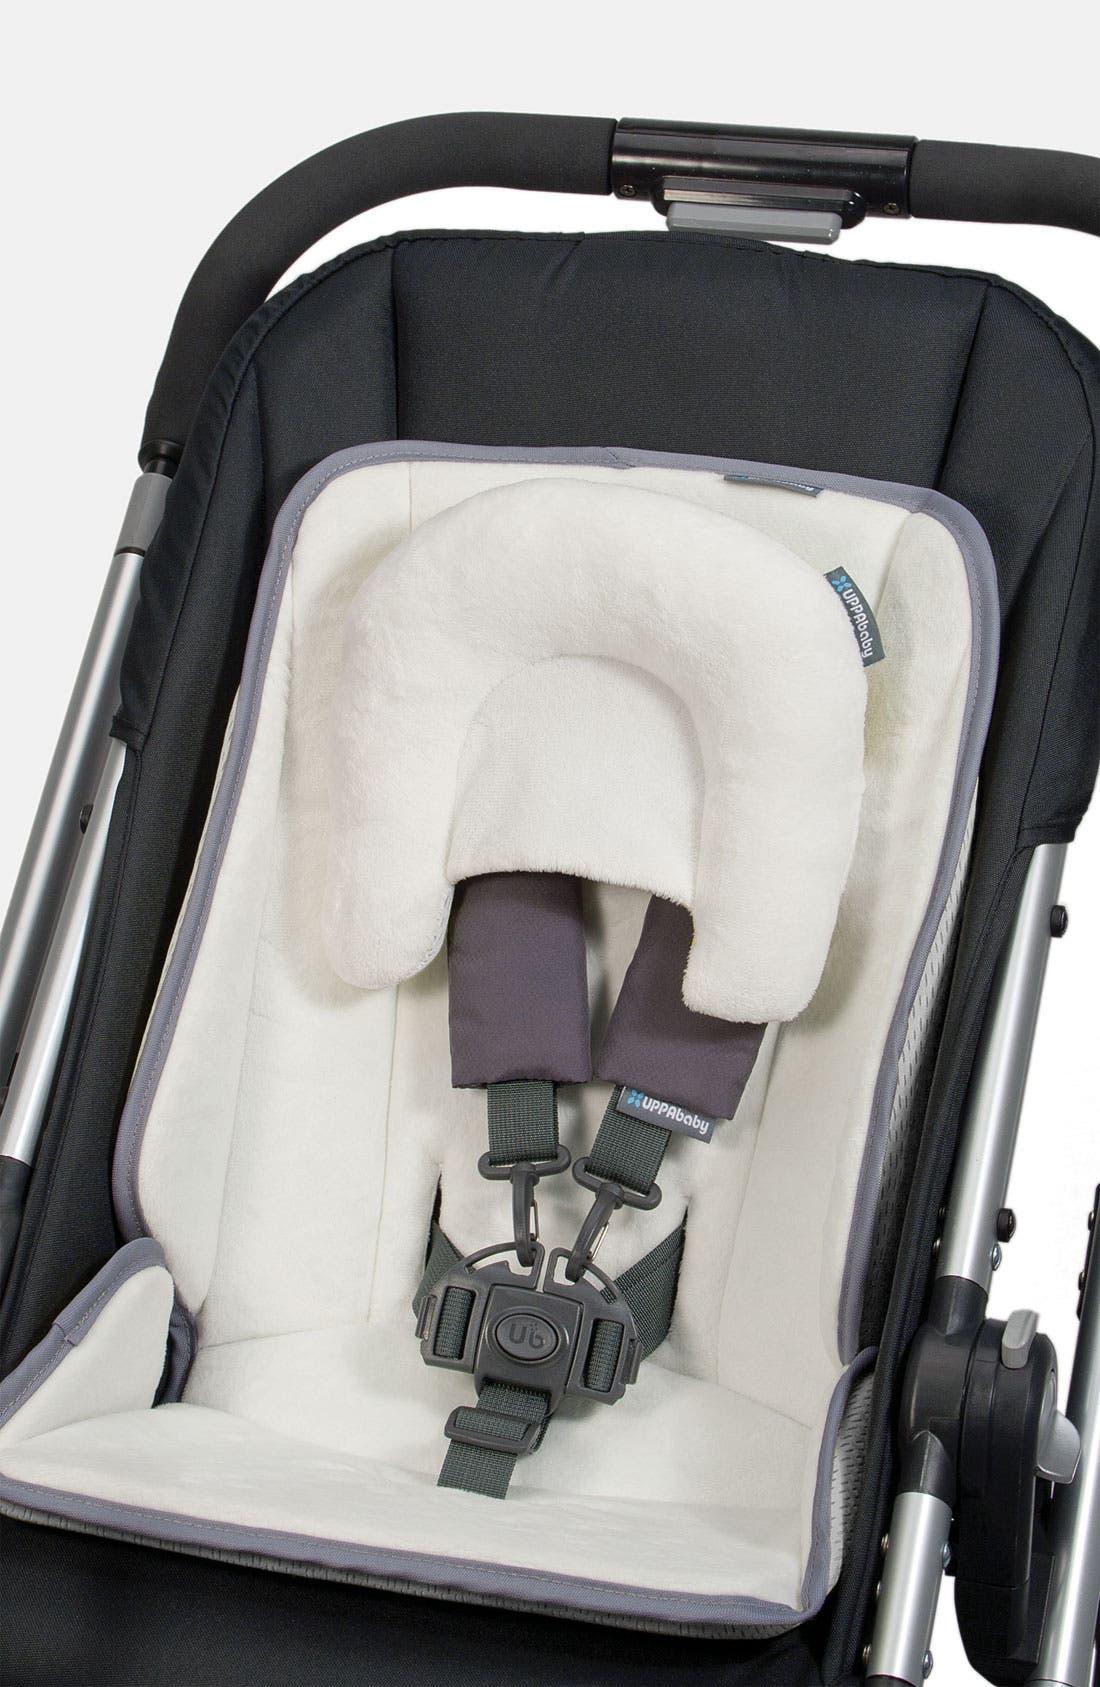 UPPAbaby VISTA & CRUZ Stroller SnugSeat Toddler Seat Inset